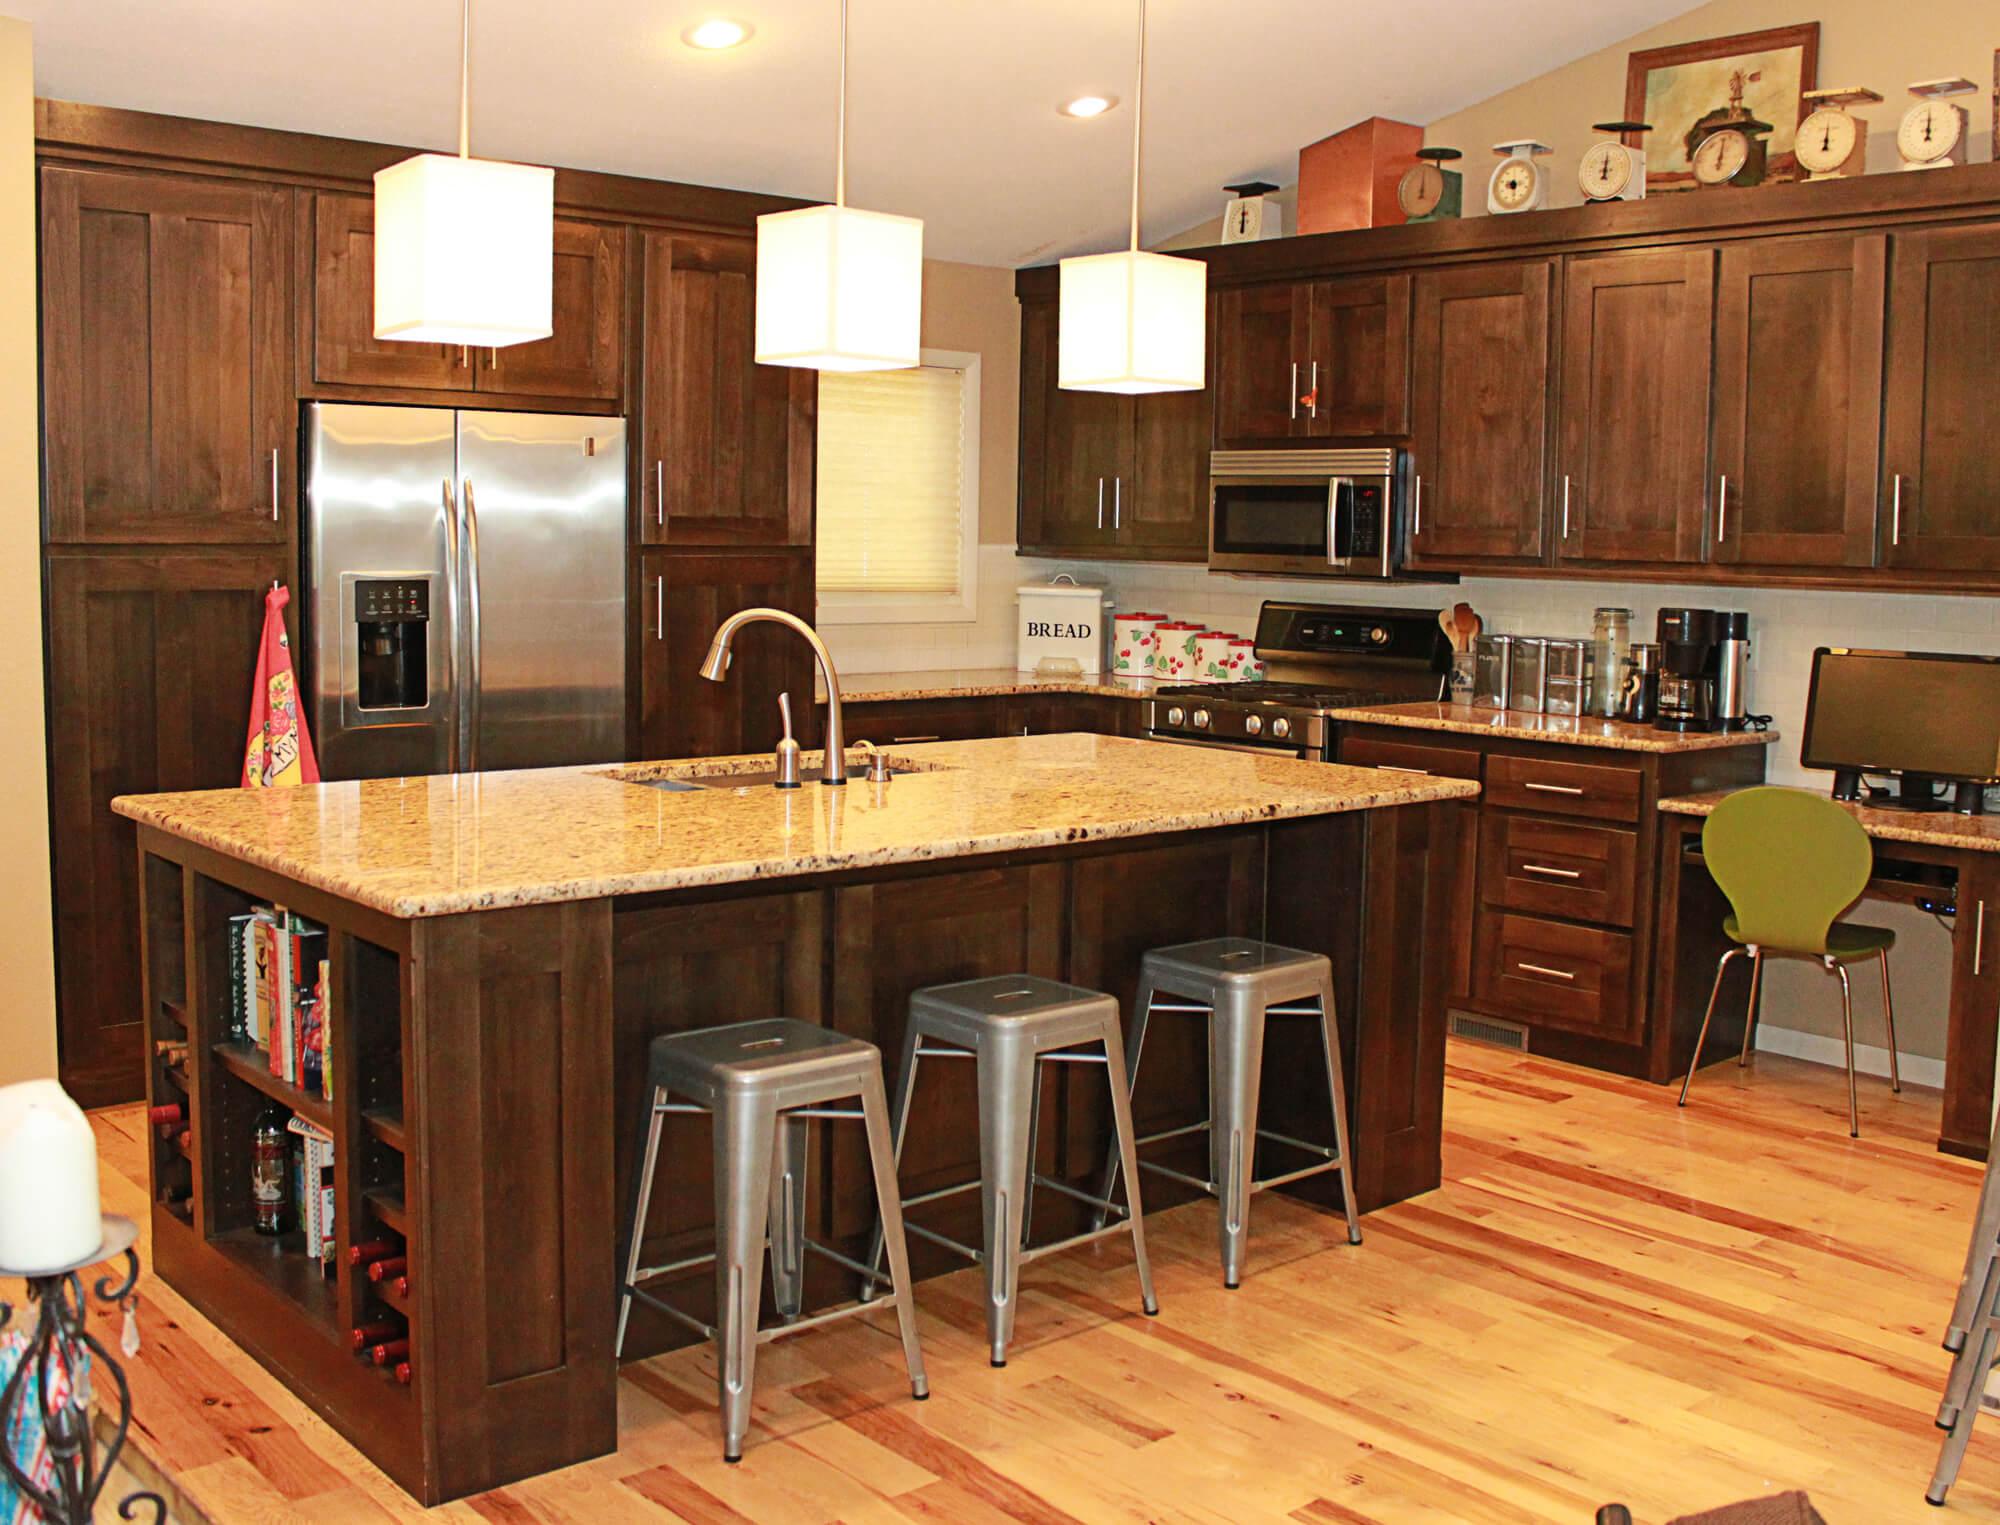 alder cabinets kitchen floor tile the plus clear